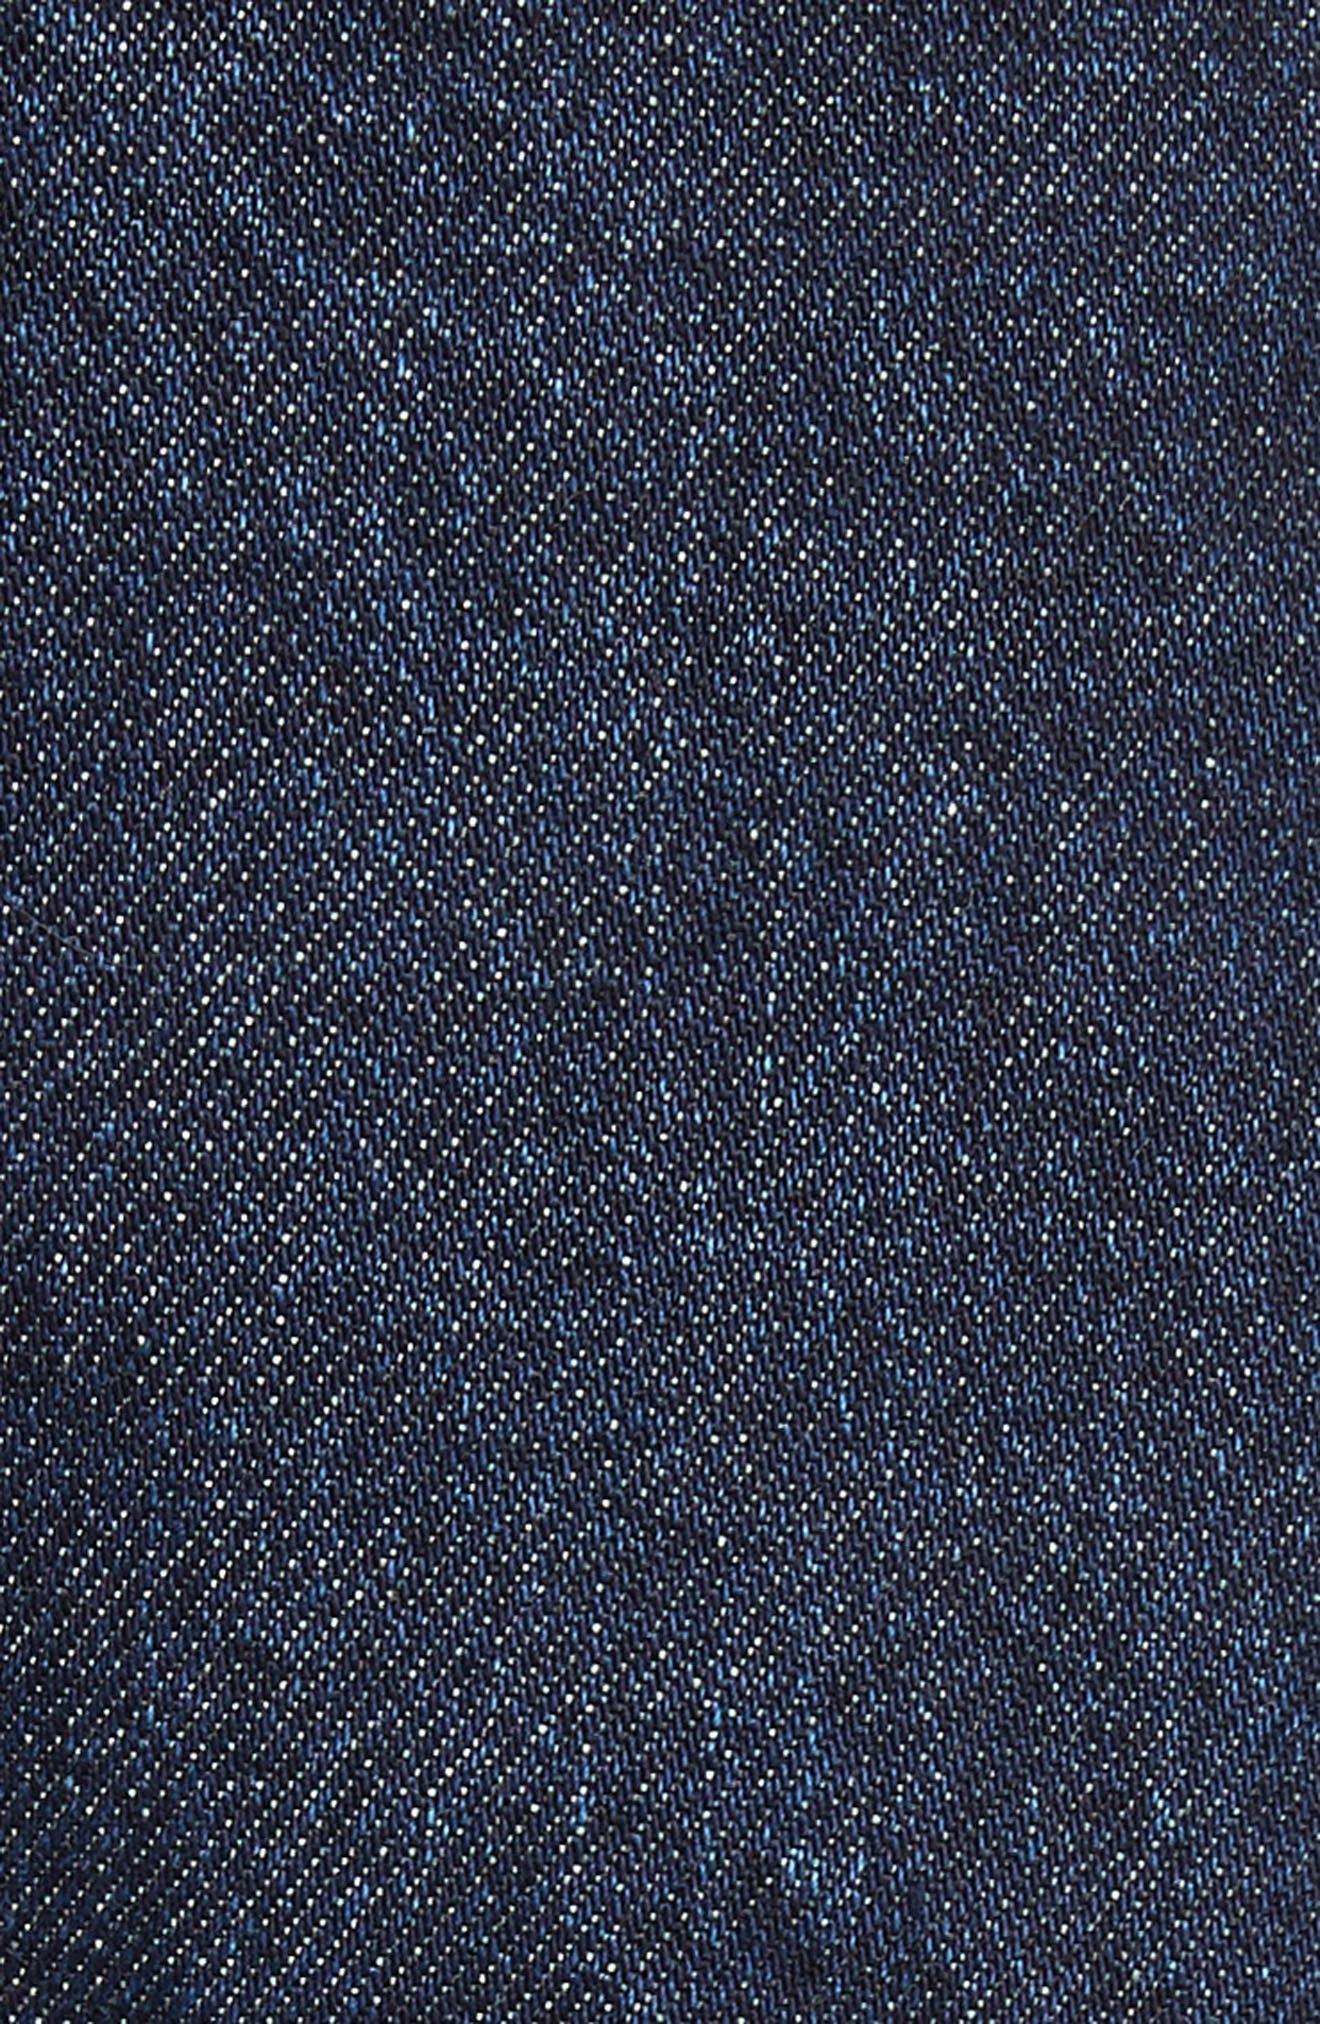 Marques'Almeida Frill Flare Crop Jeans,                             Alternate thumbnail 7, color,                             Indigo